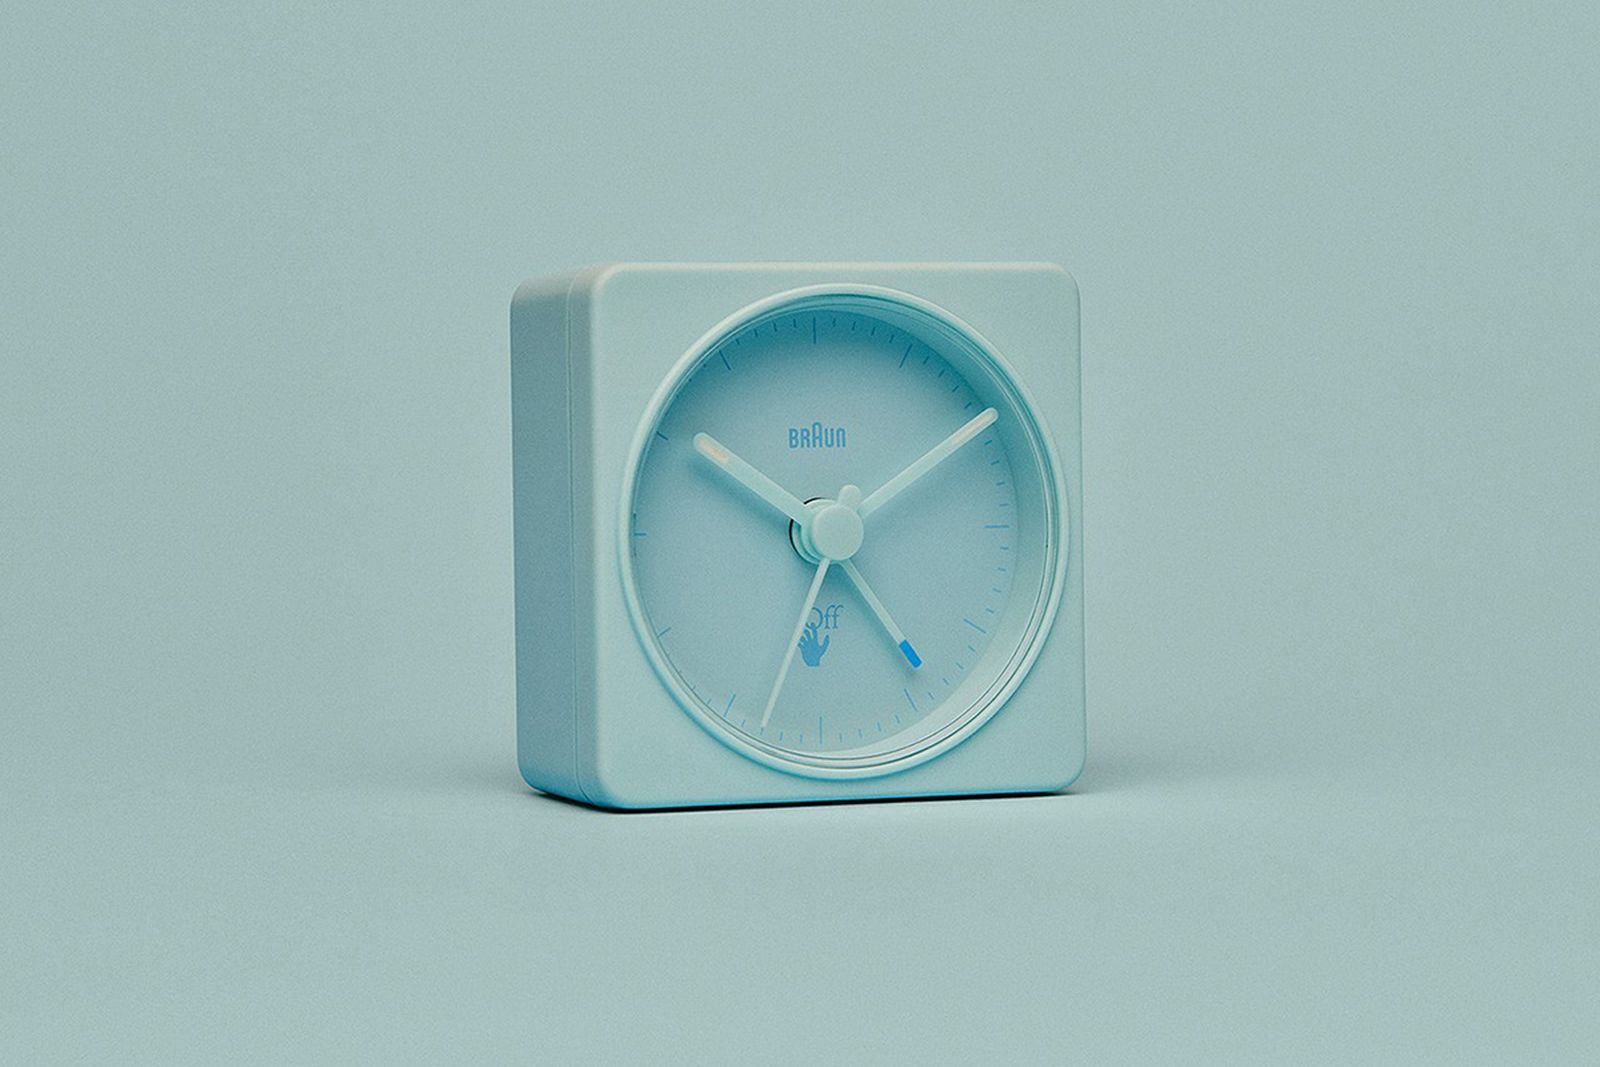 virgil-abloh-off-white-braun-alarm-clock-02